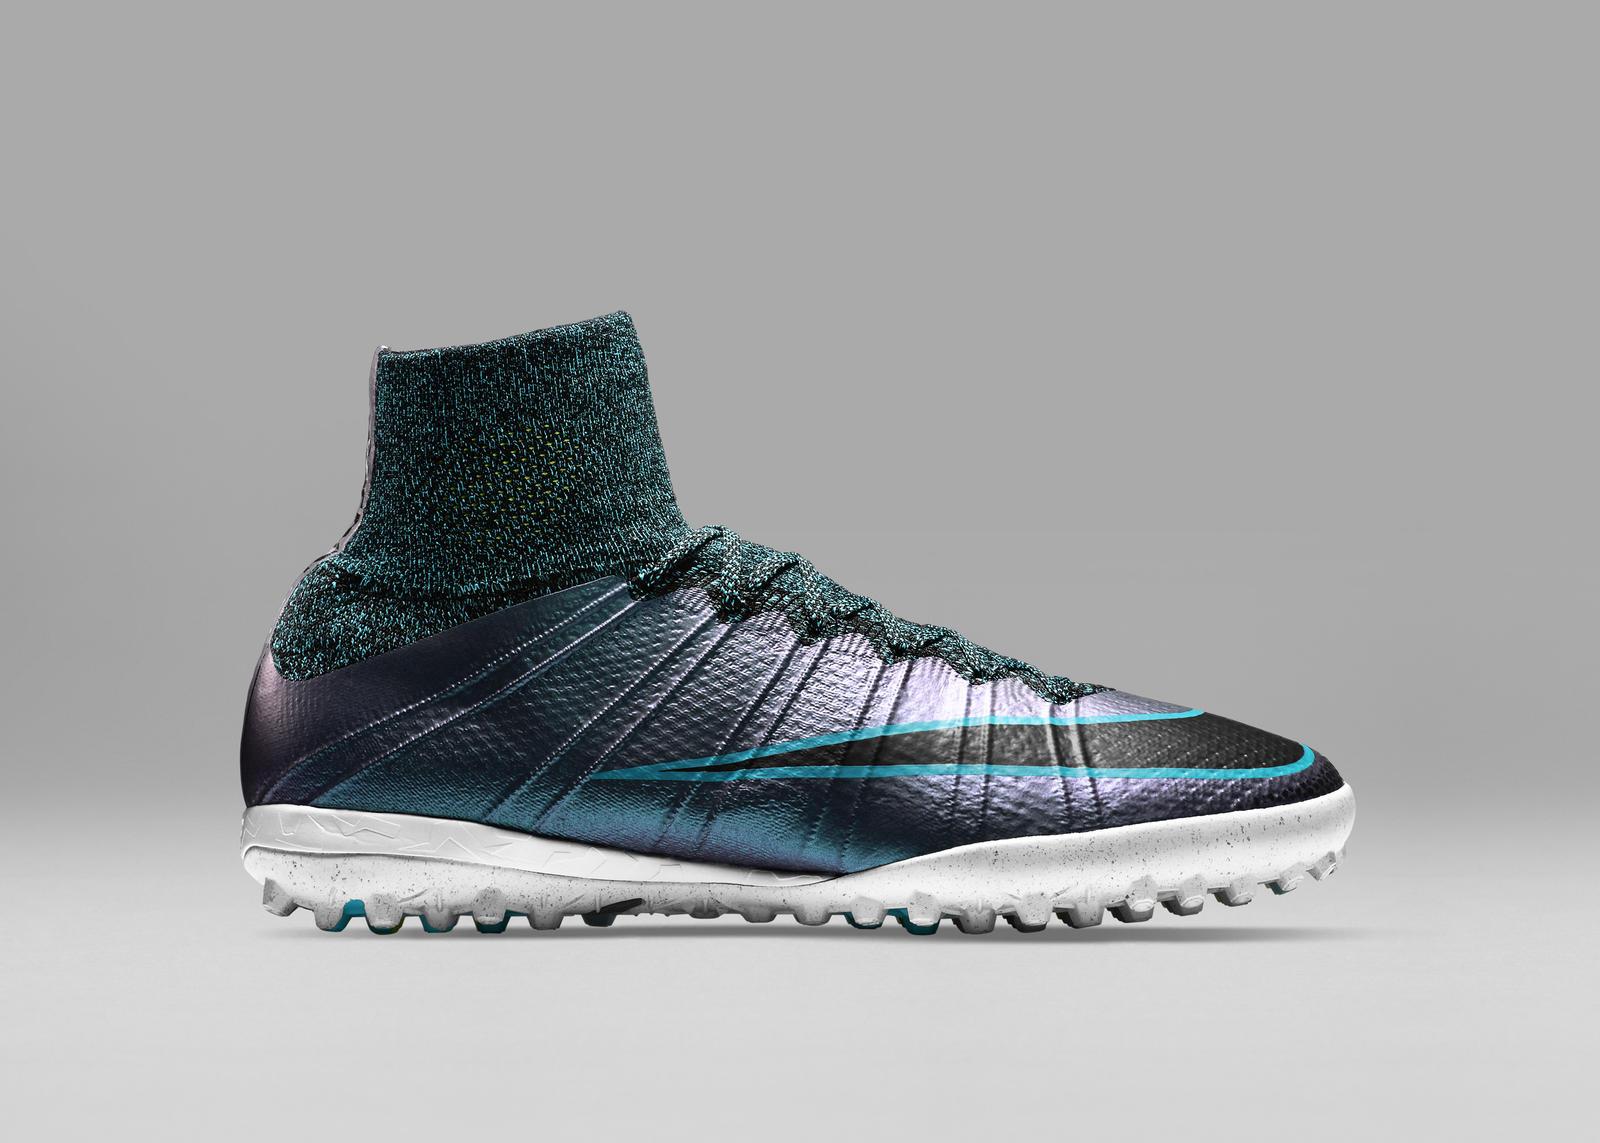 Nike Football Soccer Electro Flare Mercurialx Proximo Tf A Prem